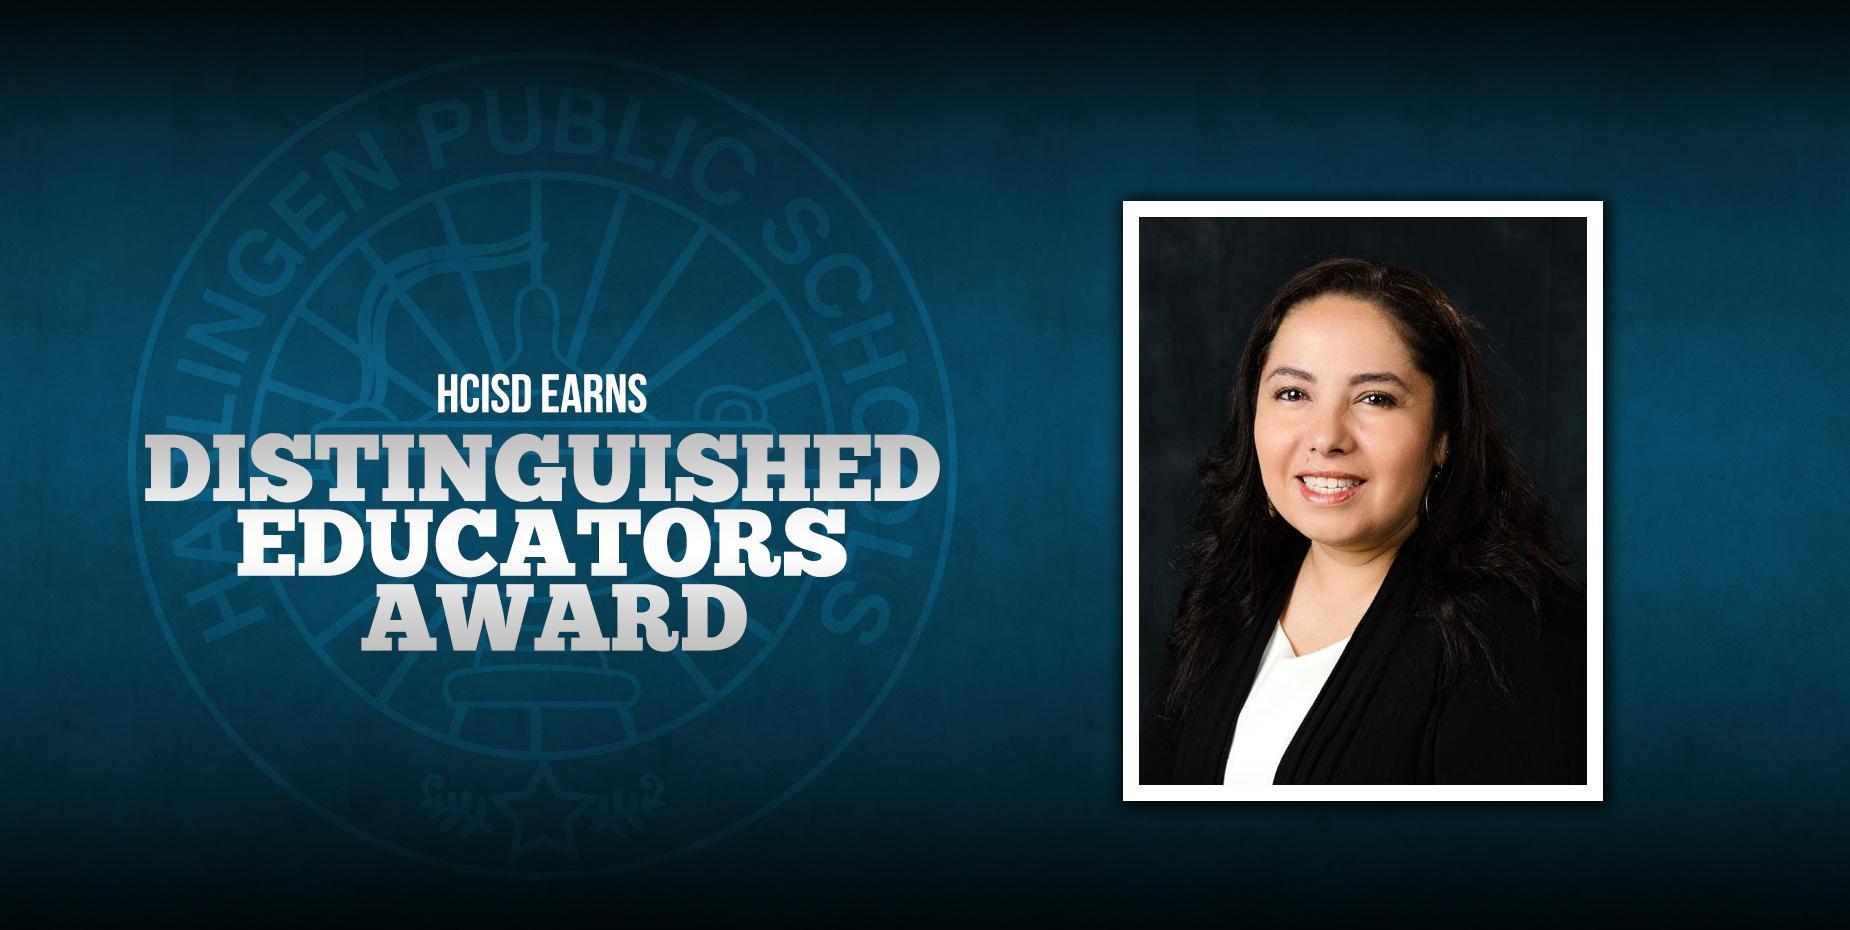 HCISD earns distinguished educators award